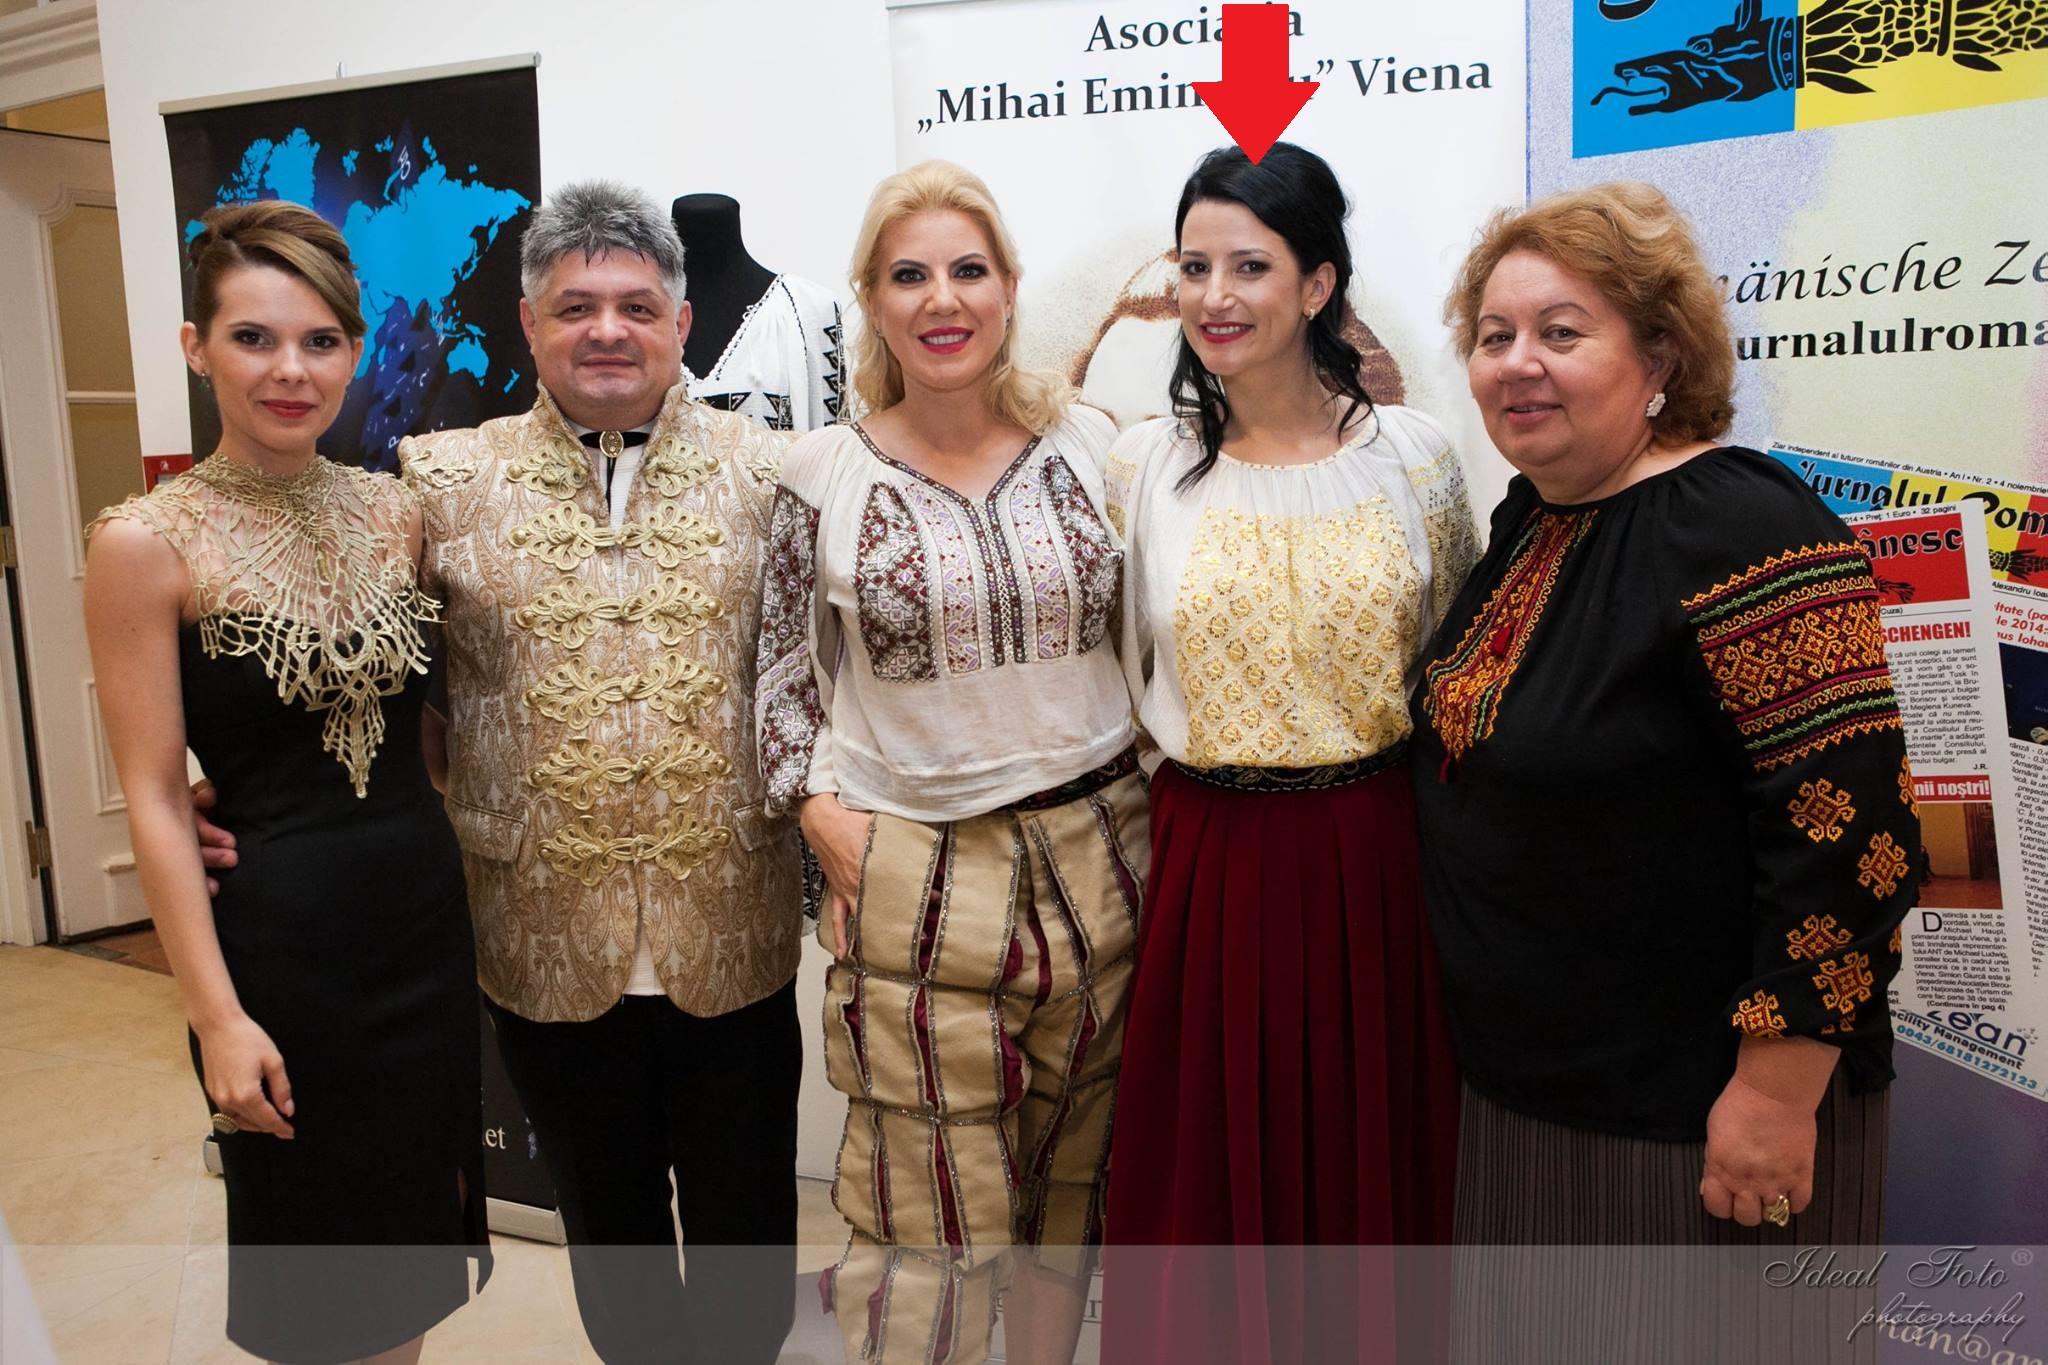 22 iunie 2016, palatul Schonbrunn (de la stânga): Eugenia Chiriac (Vrăbi), Florin Secureanu, Cristina Chiriac (om de afaceri), Laura Hant, Marilena Stoian (președinte ANTREC)